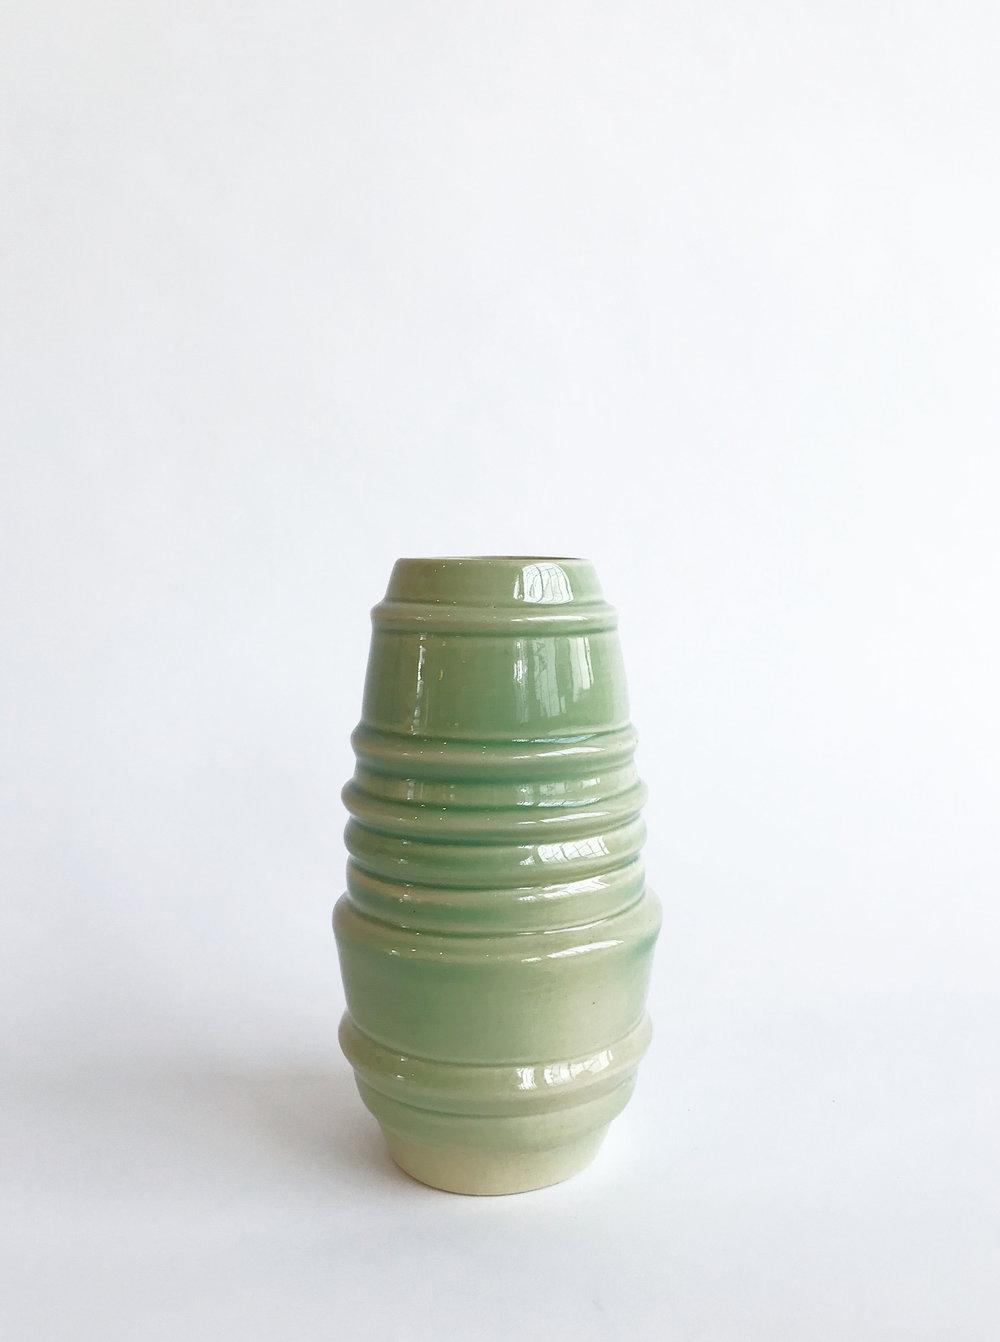 Celedon green